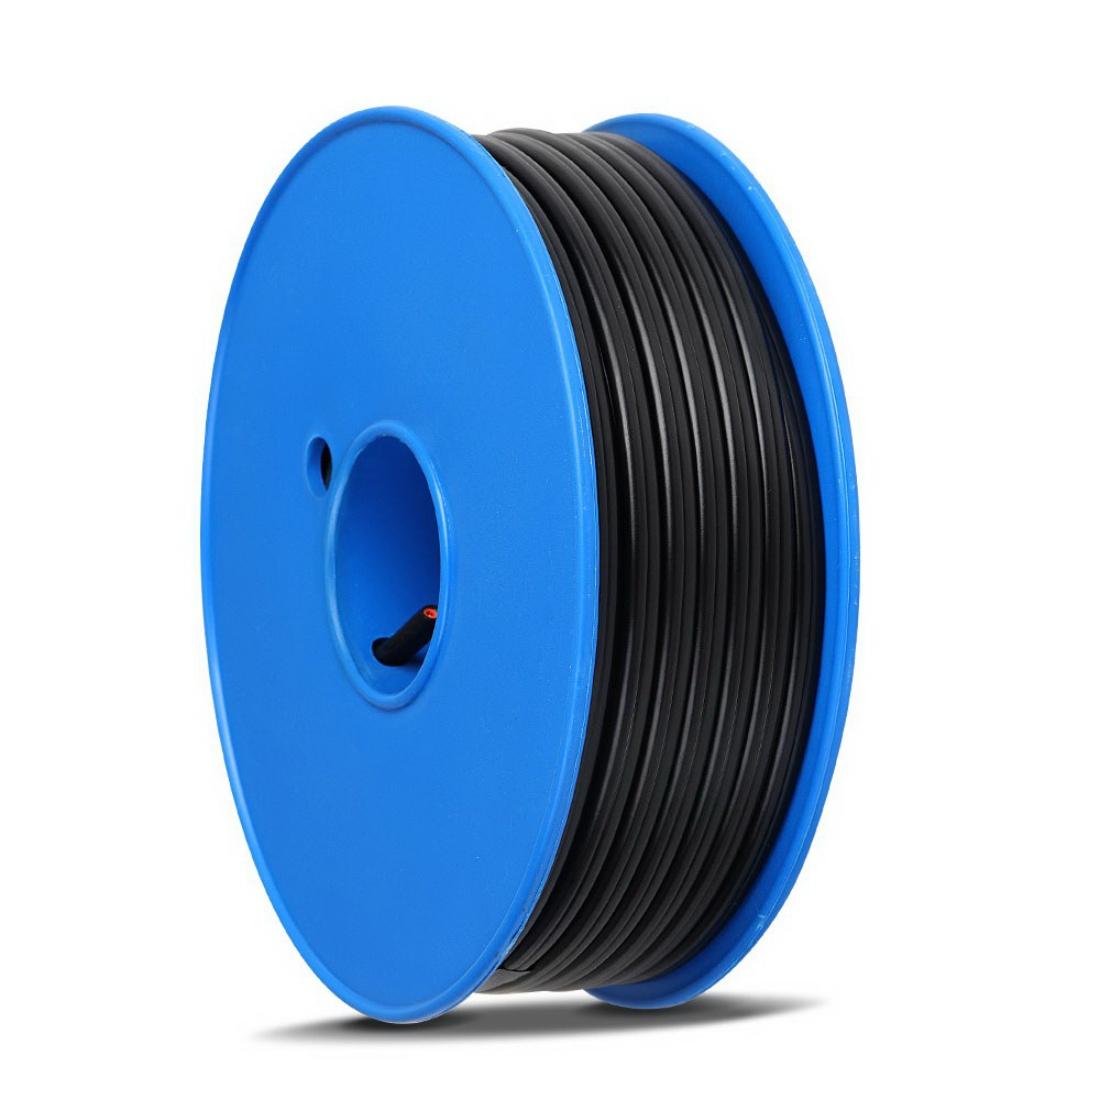 12V 4mm 30 Metre Long Solar Installation Cable